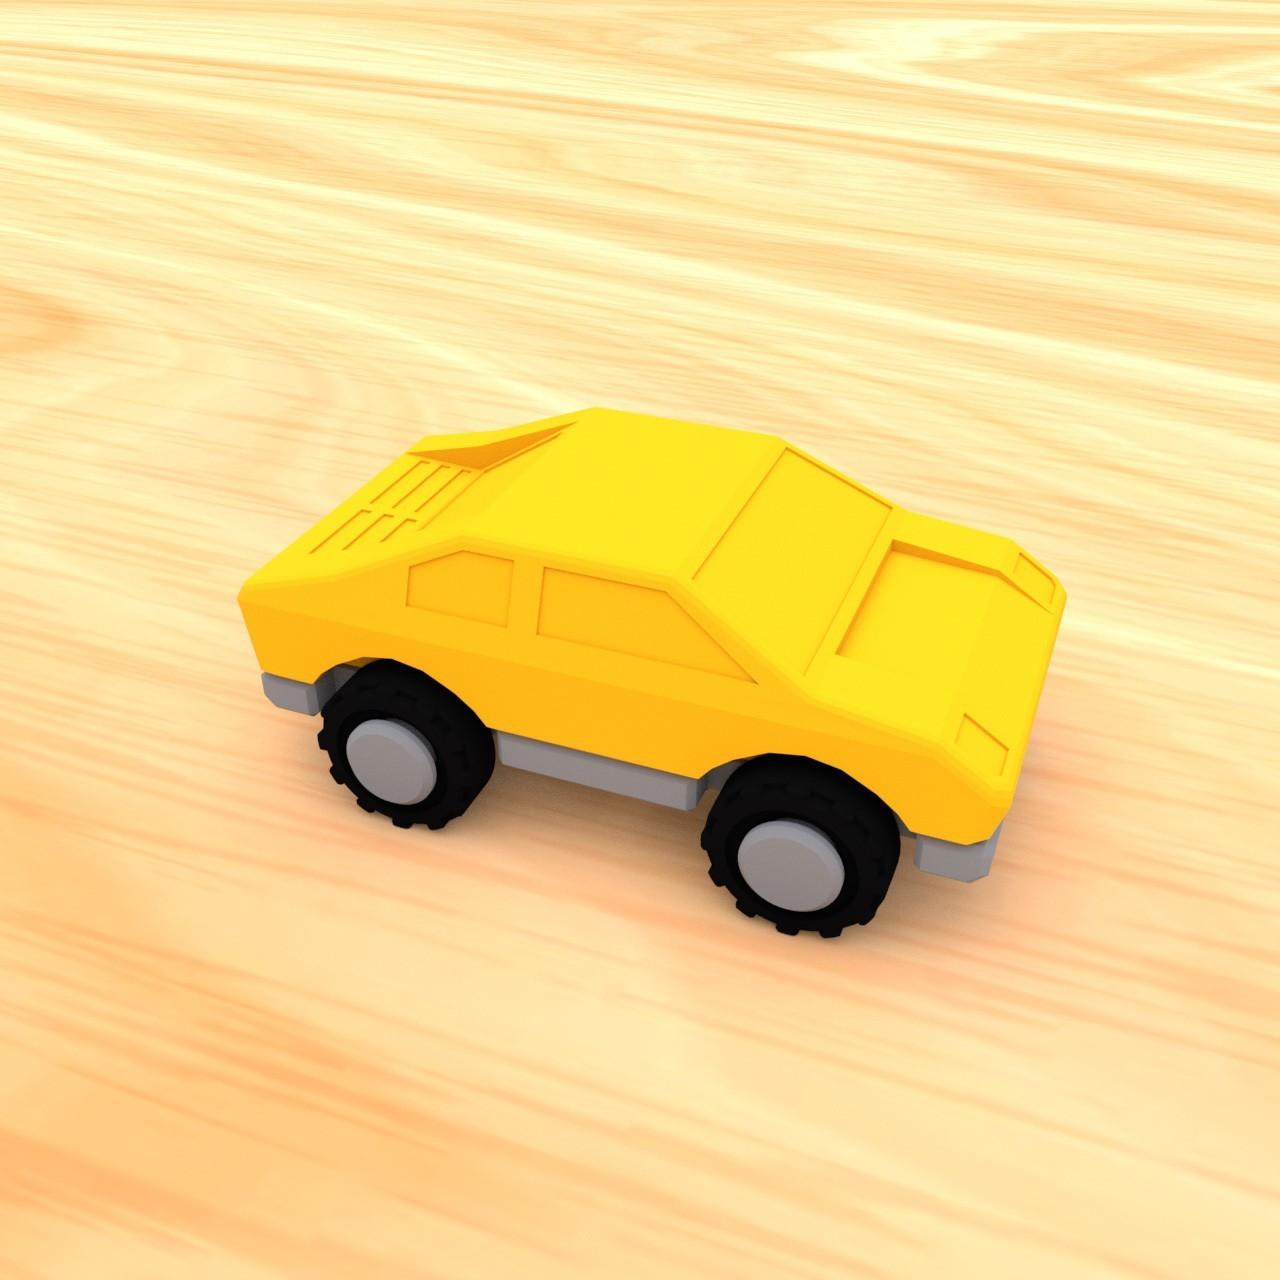 smalltoys-carspack05.jpg Download STL file SmallToys - Cars pack • 3D print design, Wabby